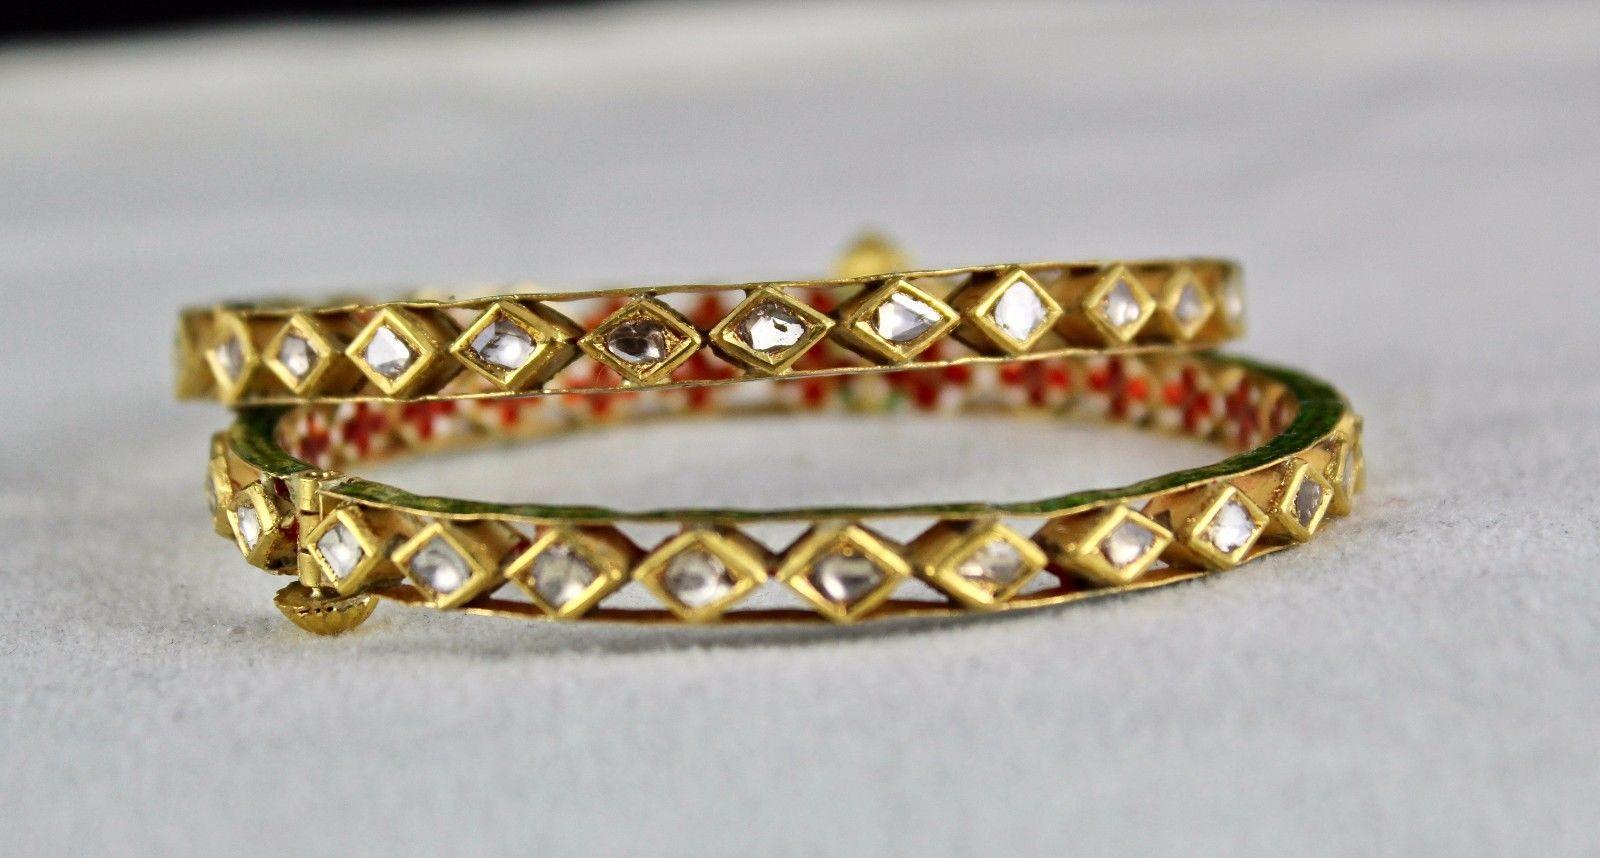 FLAT DIAMOND STUDDED IN 22K  GOLD JADAU MEENA BANGLES FOR LADIES